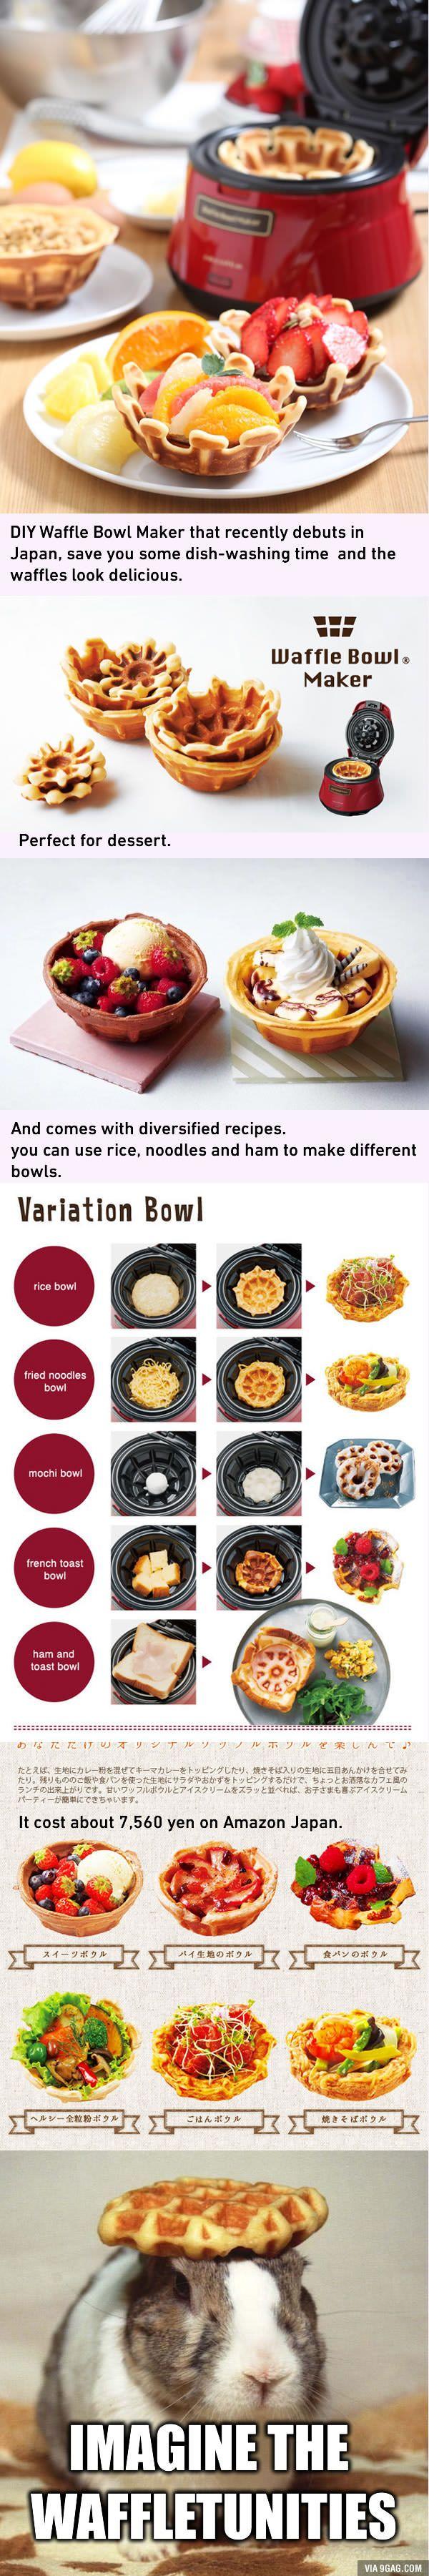 Imagine The Waffletunities! Japan Invented Waffle Bowl Maker - 9GAG http://www.juicerblendercenter.com